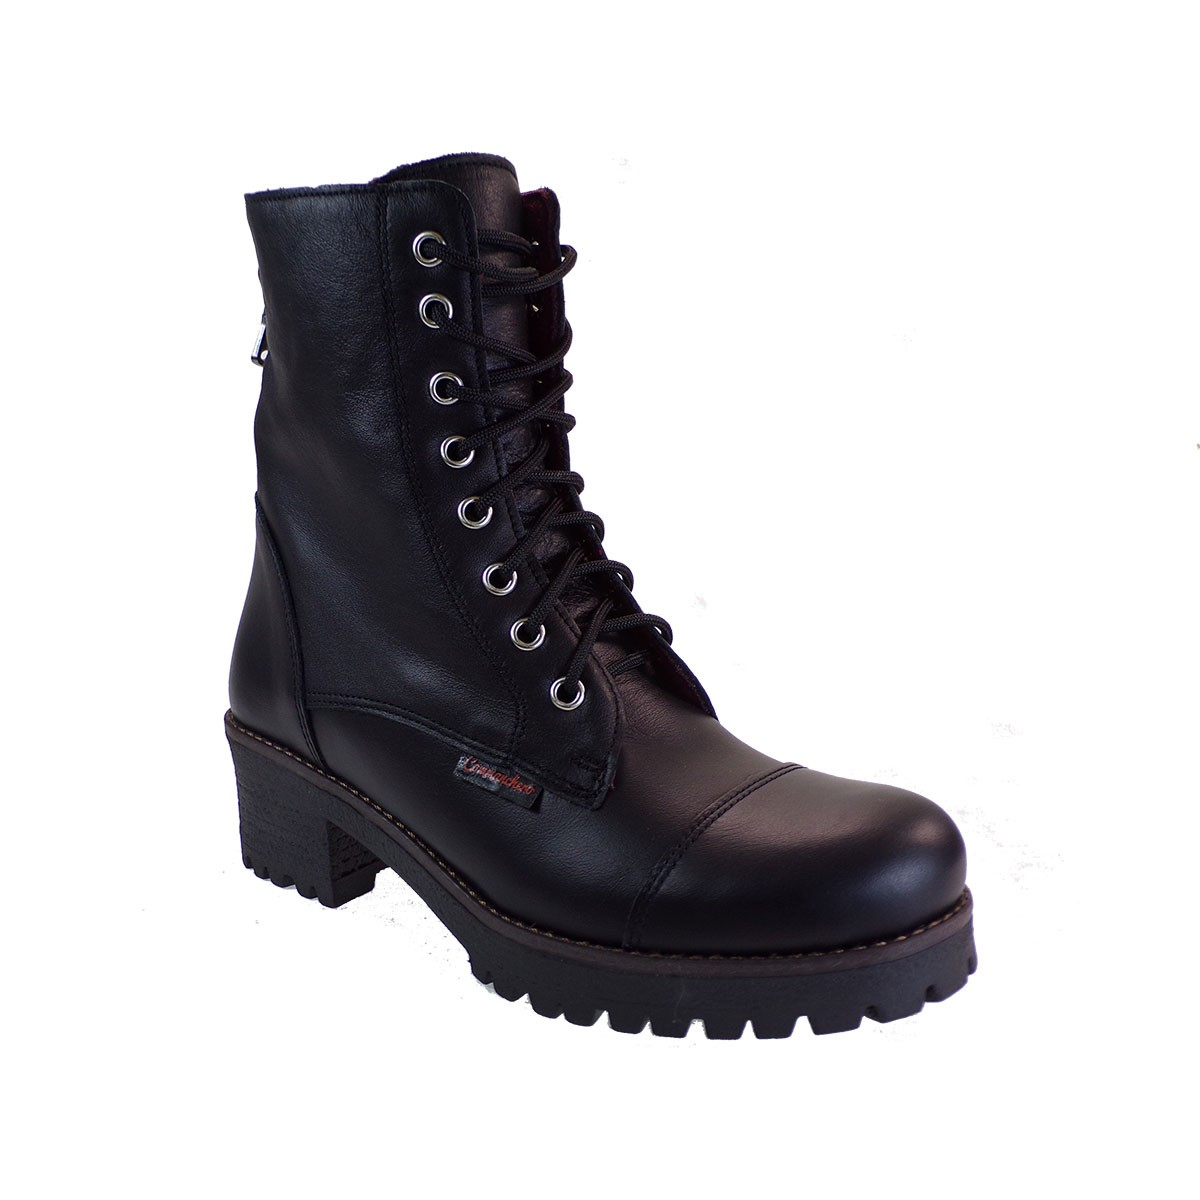 Commanchero Γυναικεία Παπούτσια Μποτάκια Αρβυλάκια 5312-721 Μαύρο Δέρμα